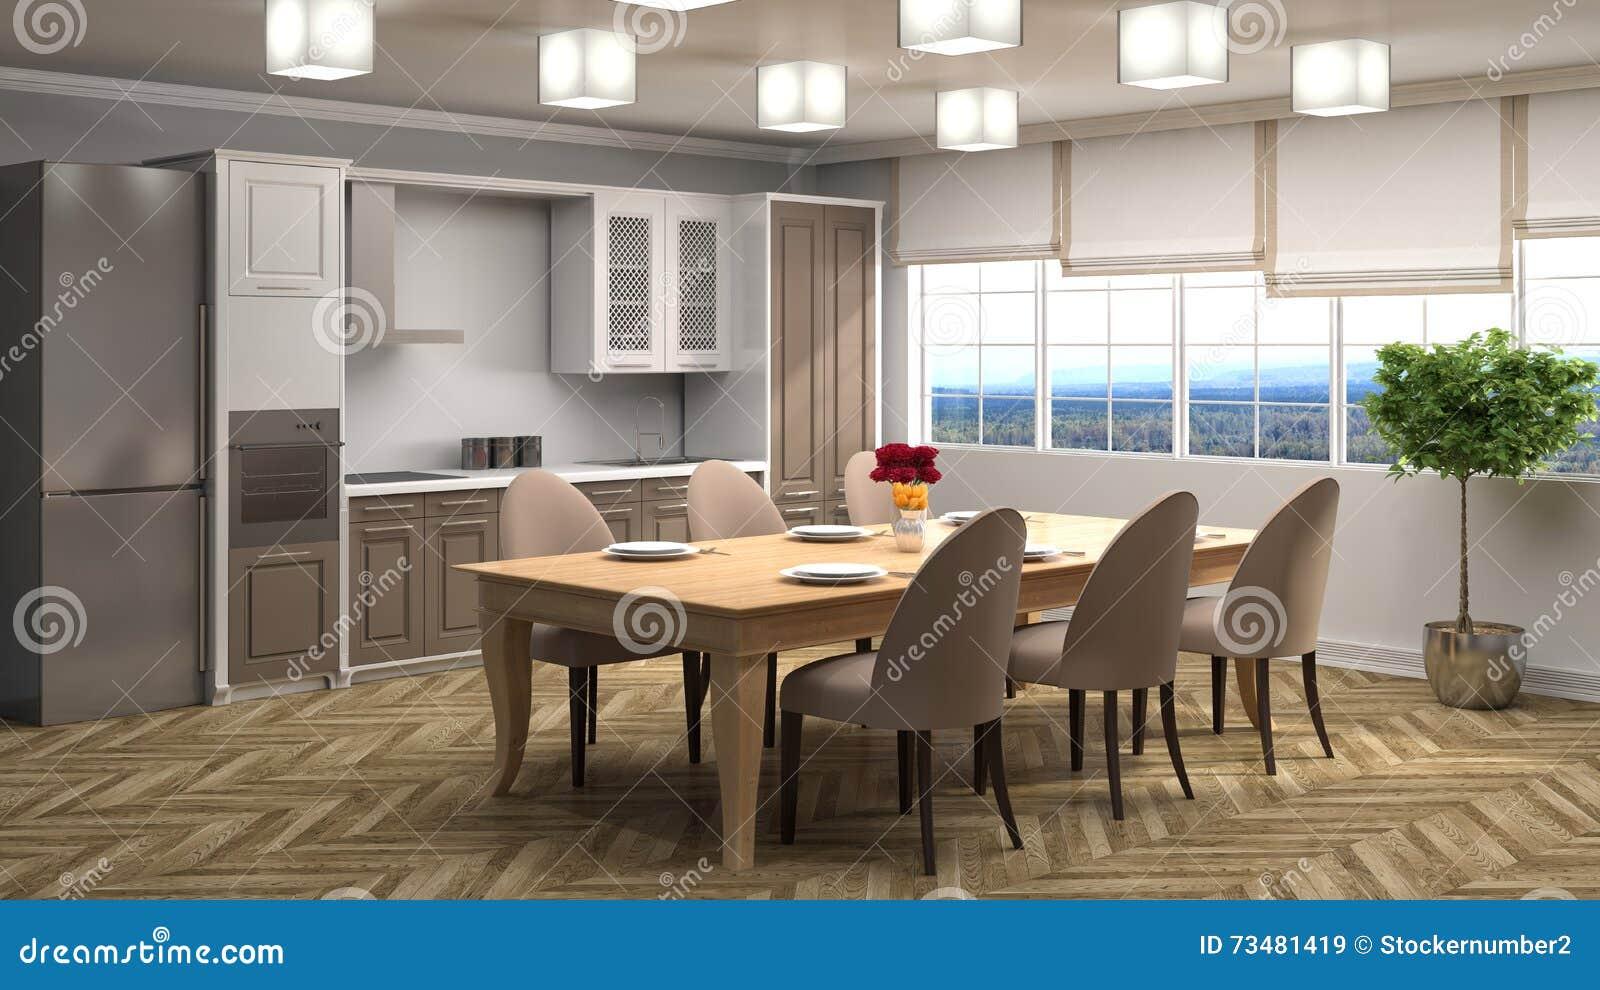 нутряная кухня иллюстрация 3d